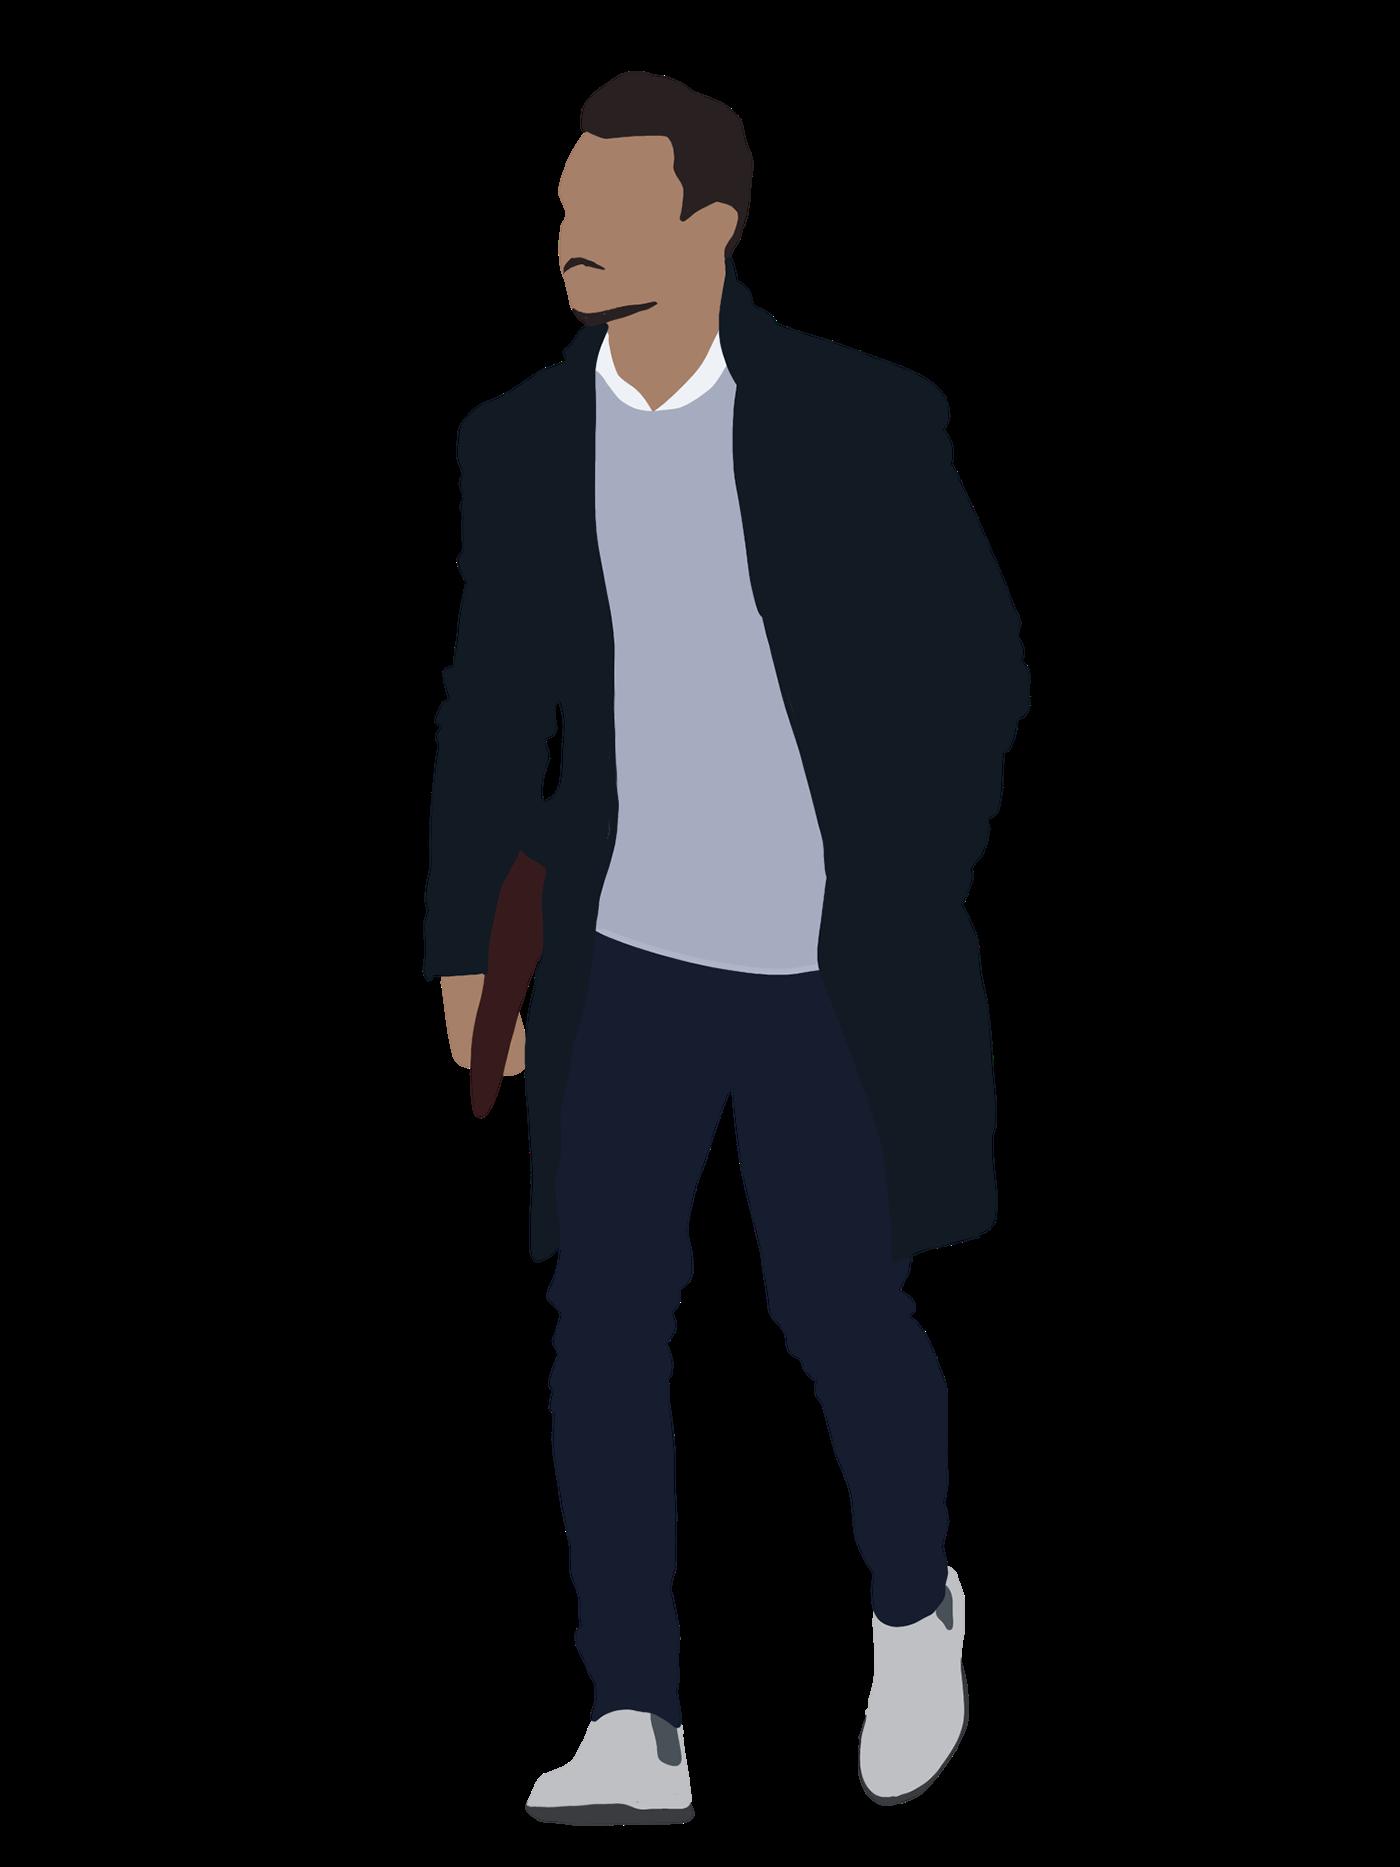 People Flat Illustration on Behance